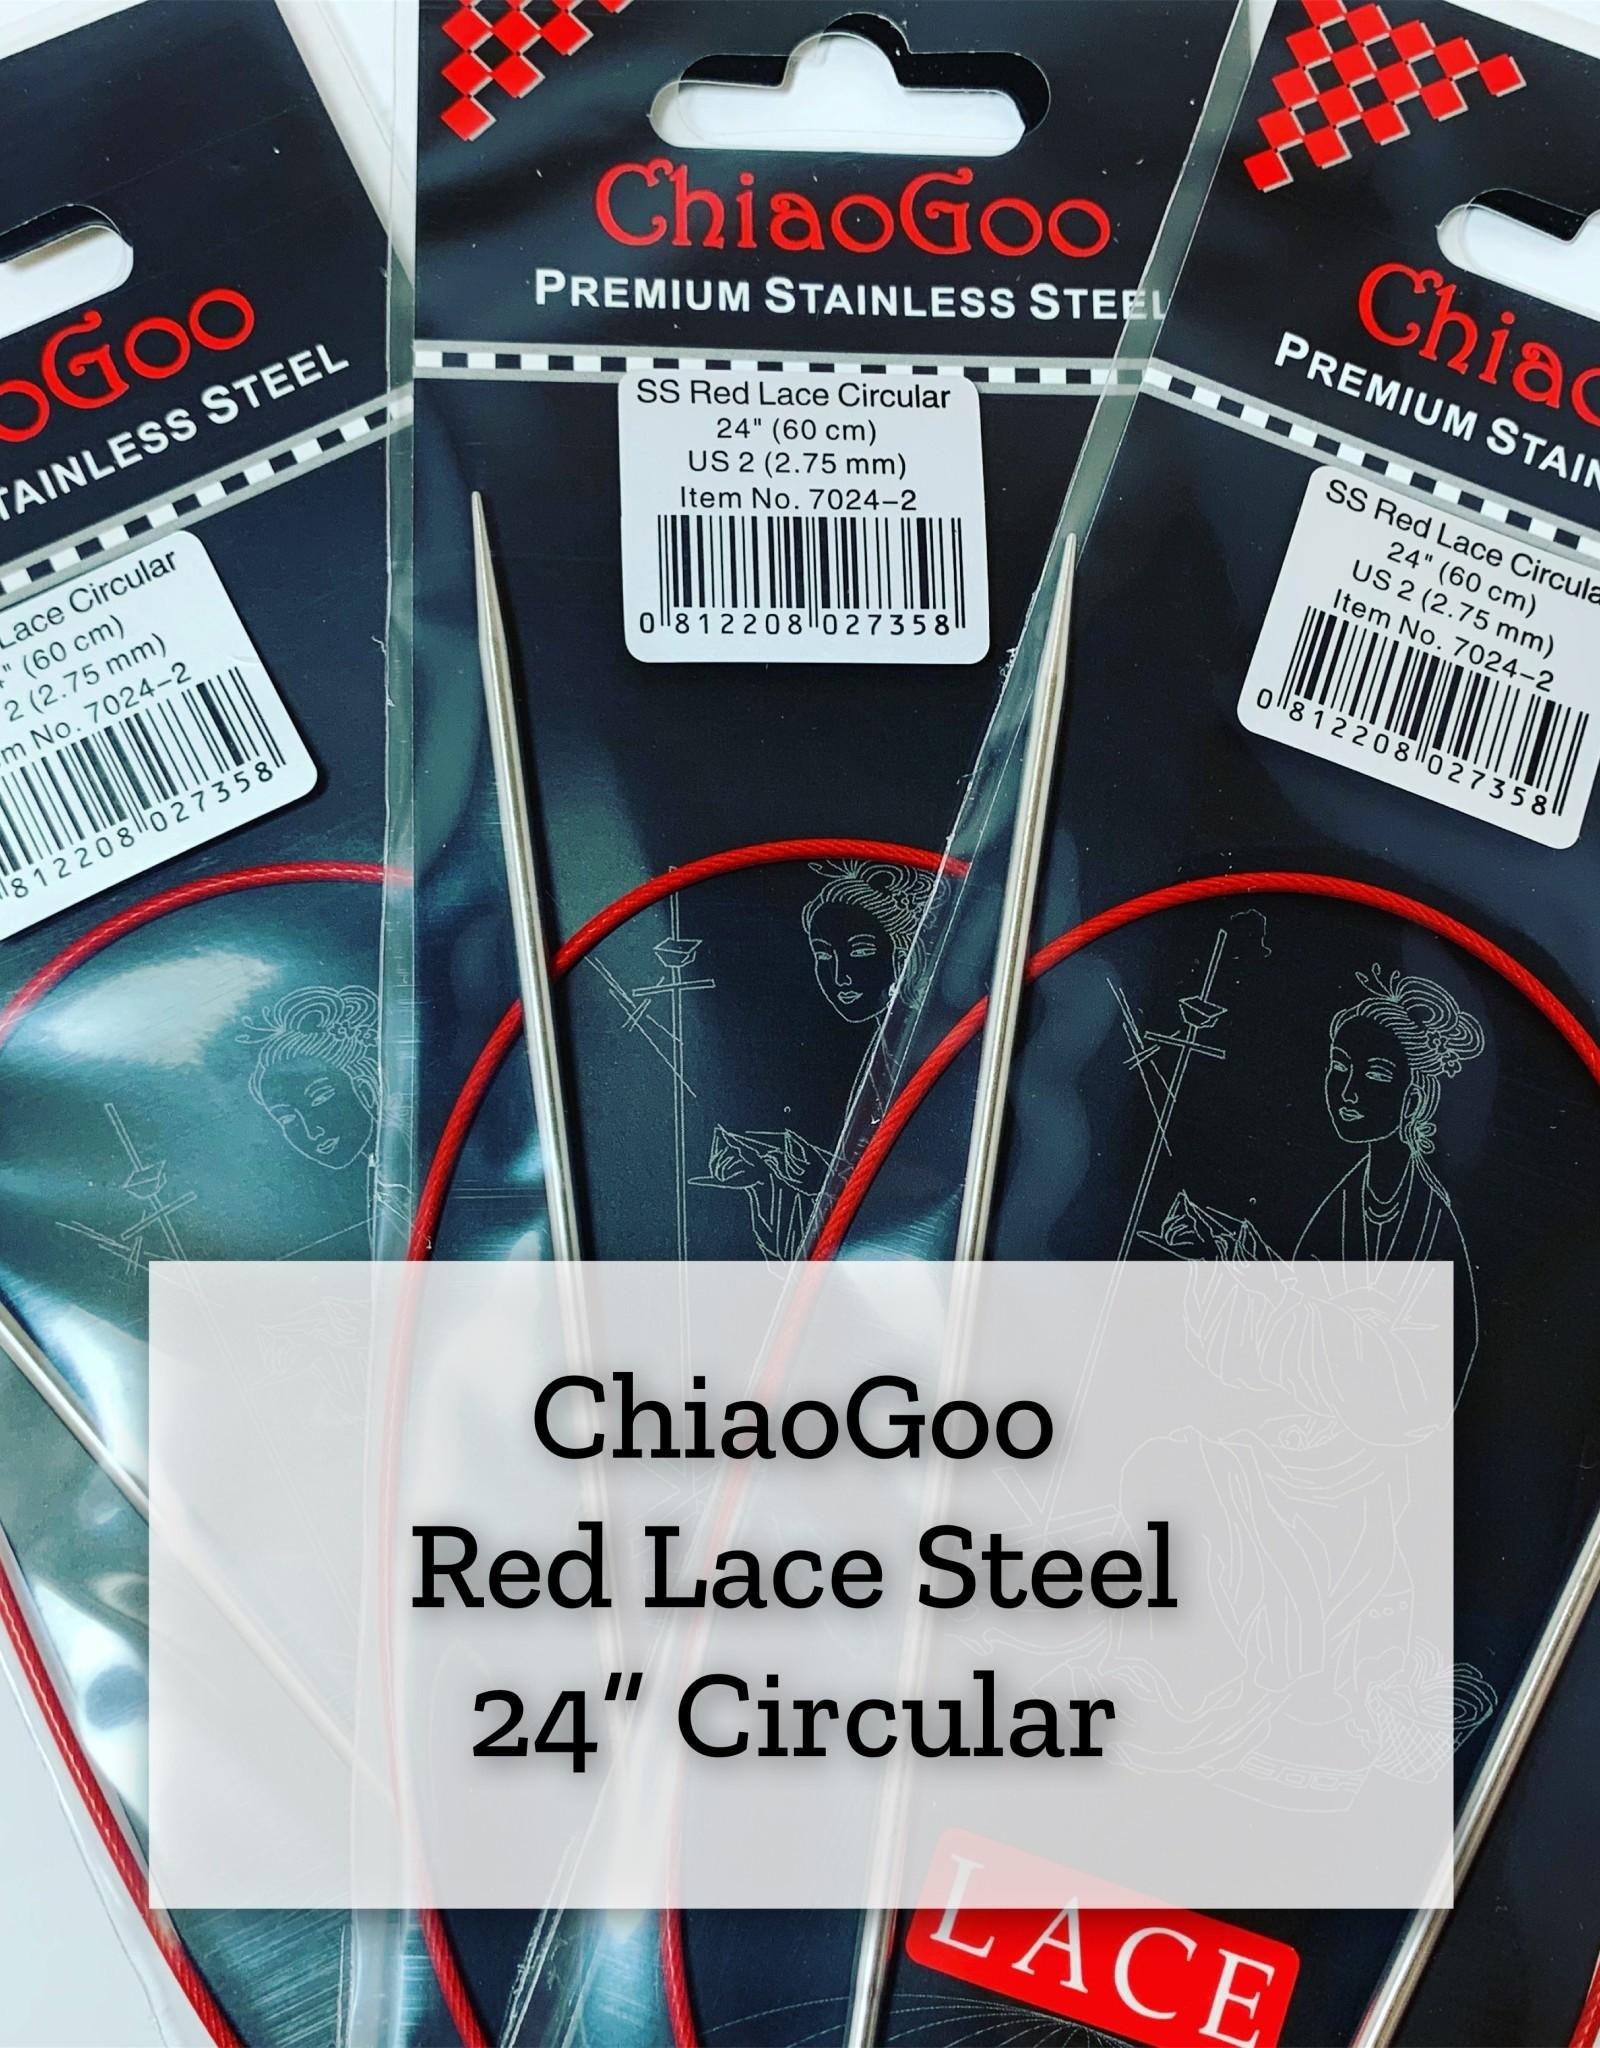 "ChiaoGoo Red Lace Steel - 24"" 5.5 mm"